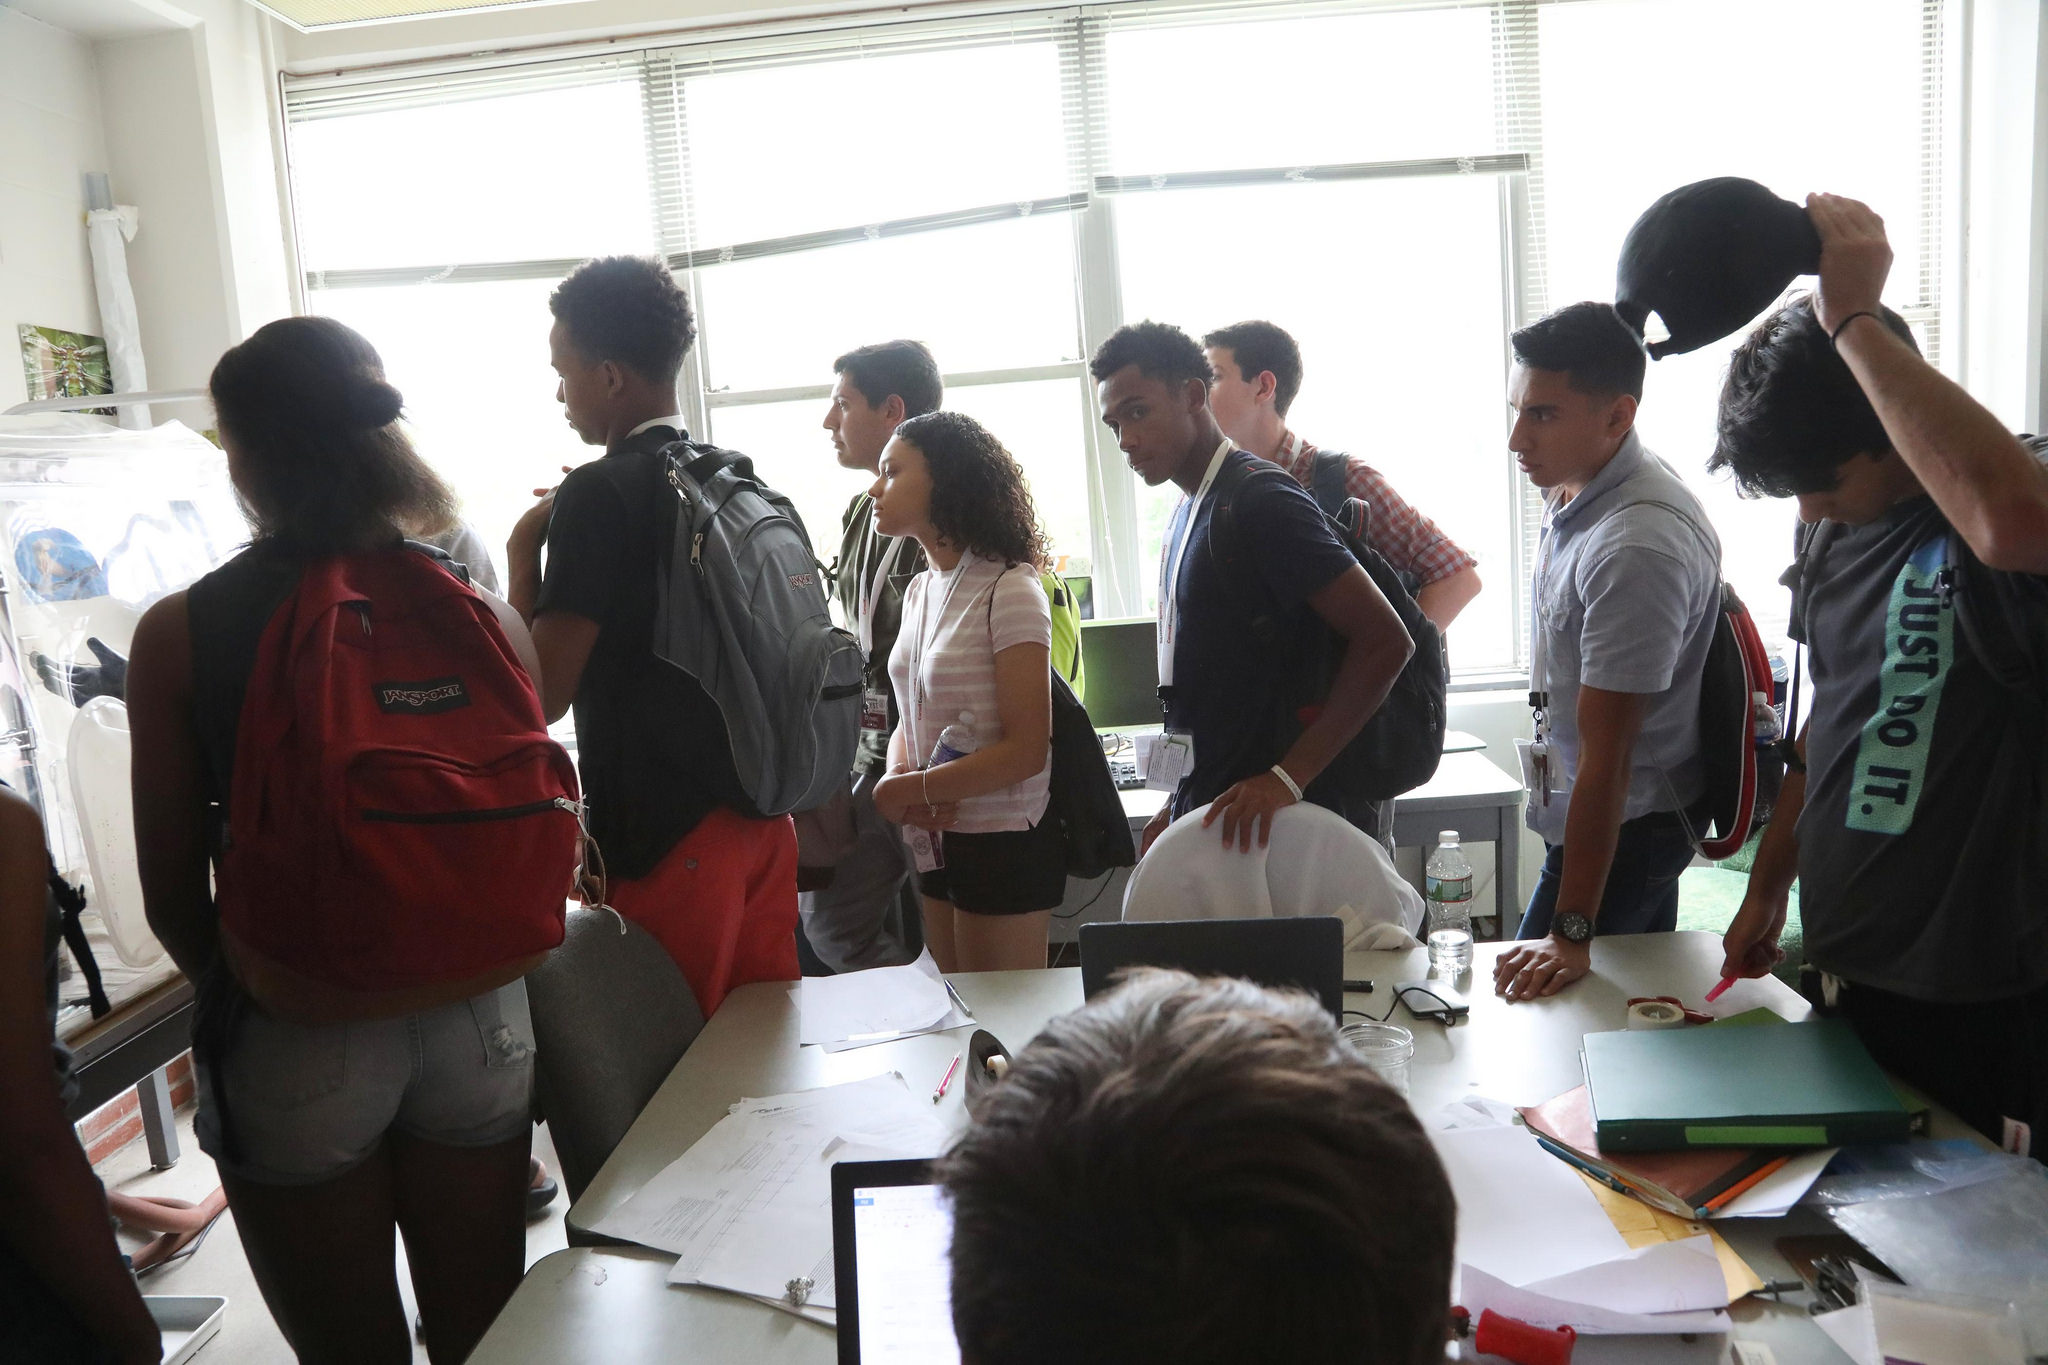 Students observe an experiment